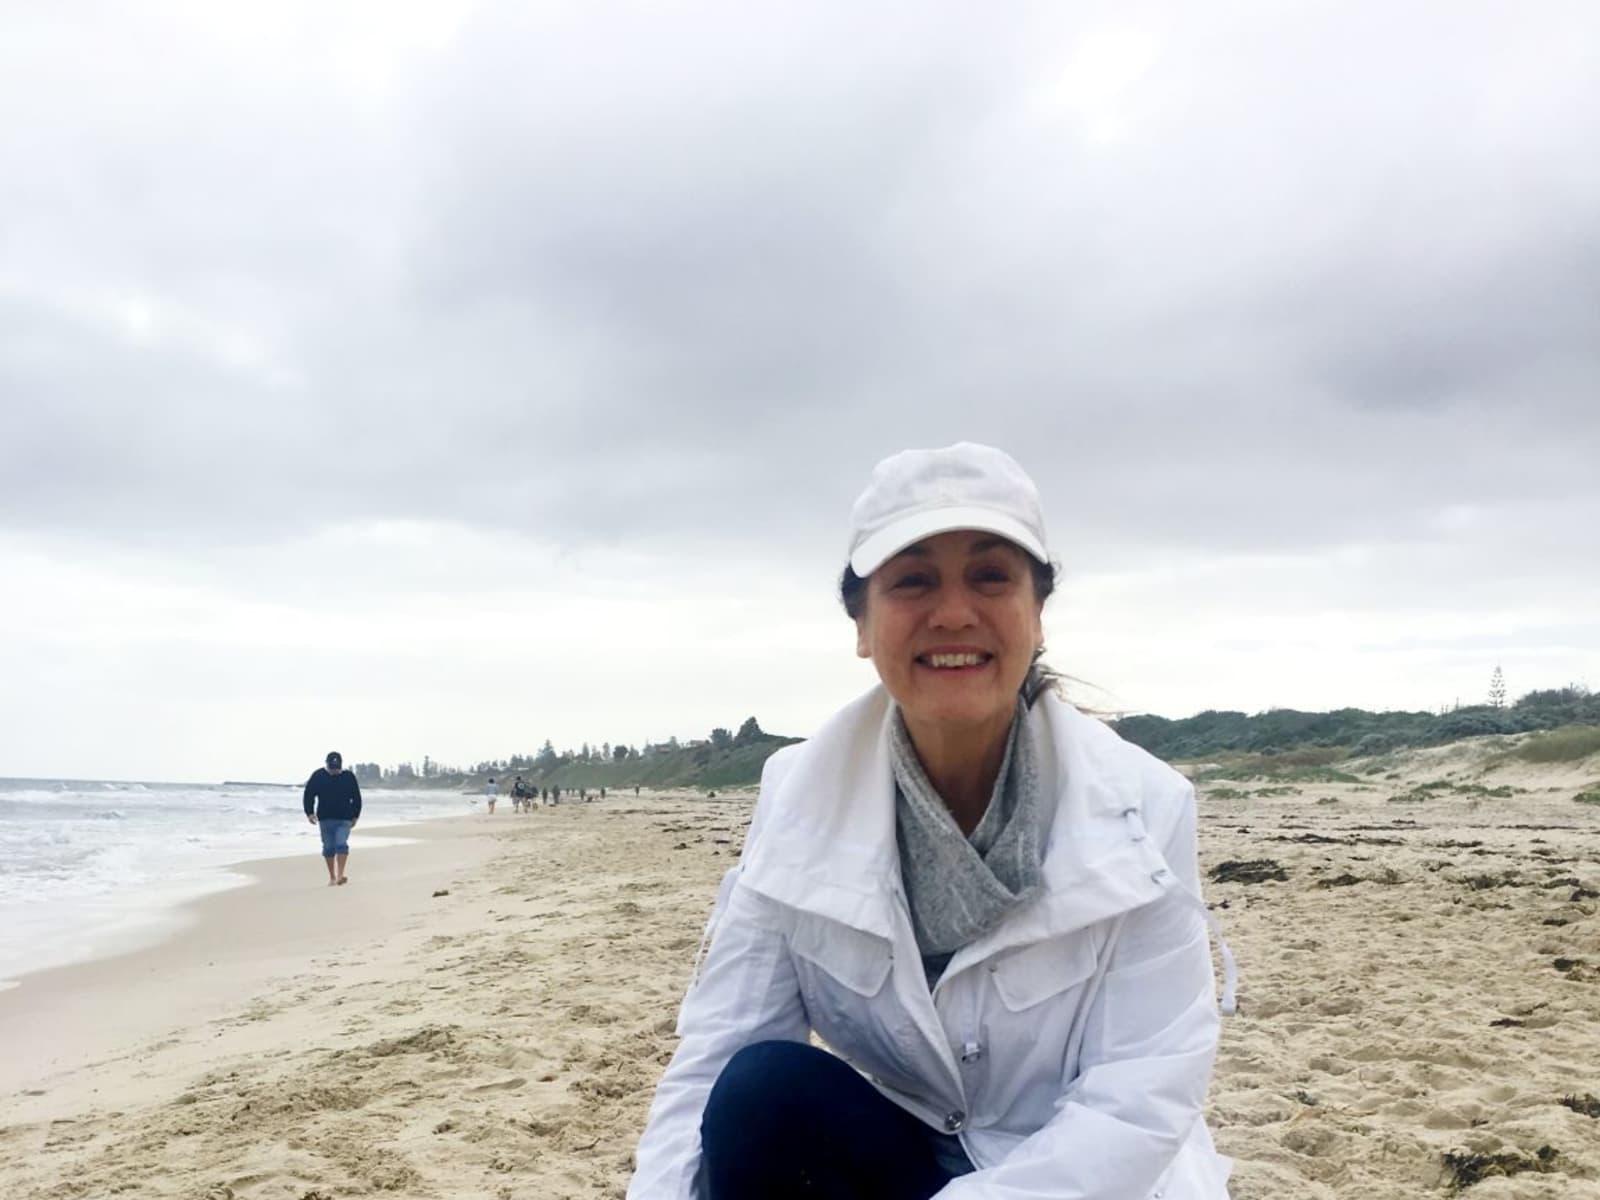 Anita from Perth, Western Australia, Australia